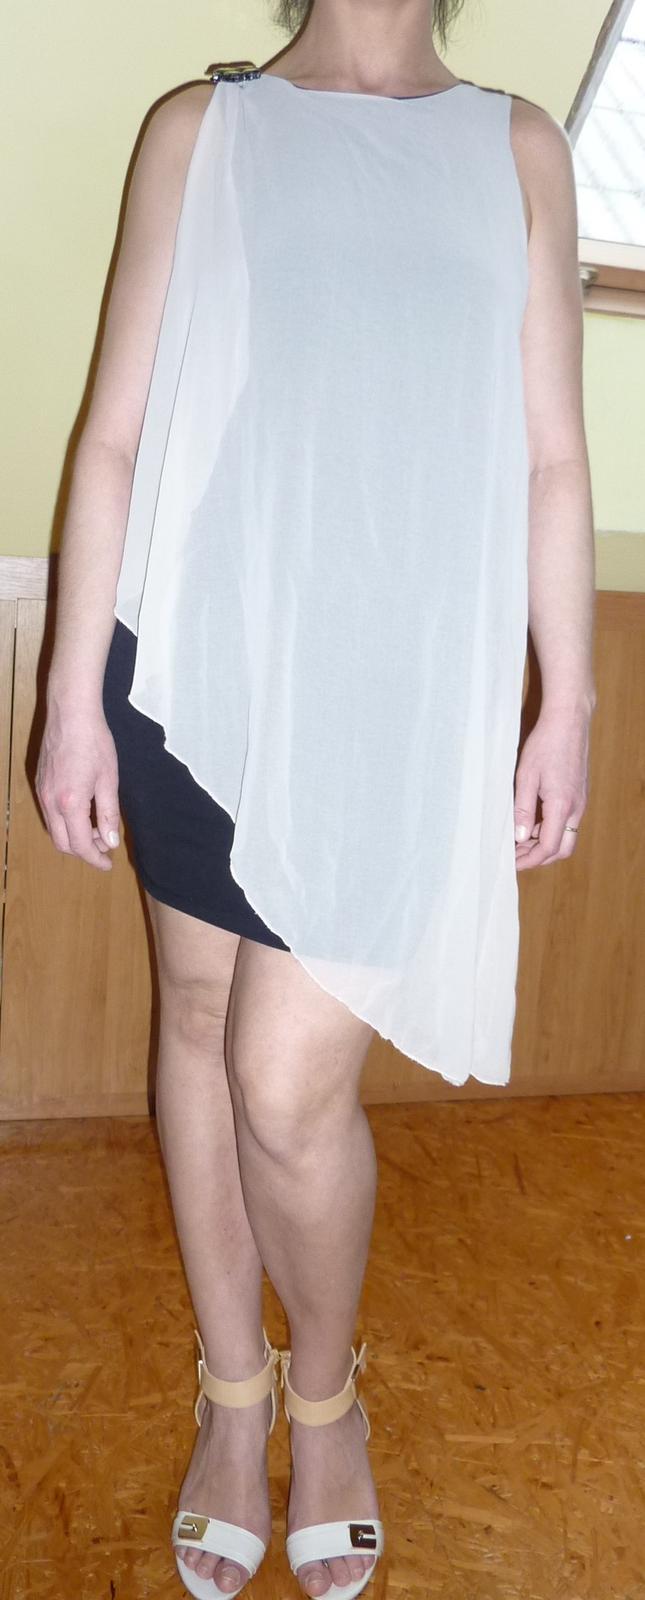 šik talianske šaty - Obrázok č. 1